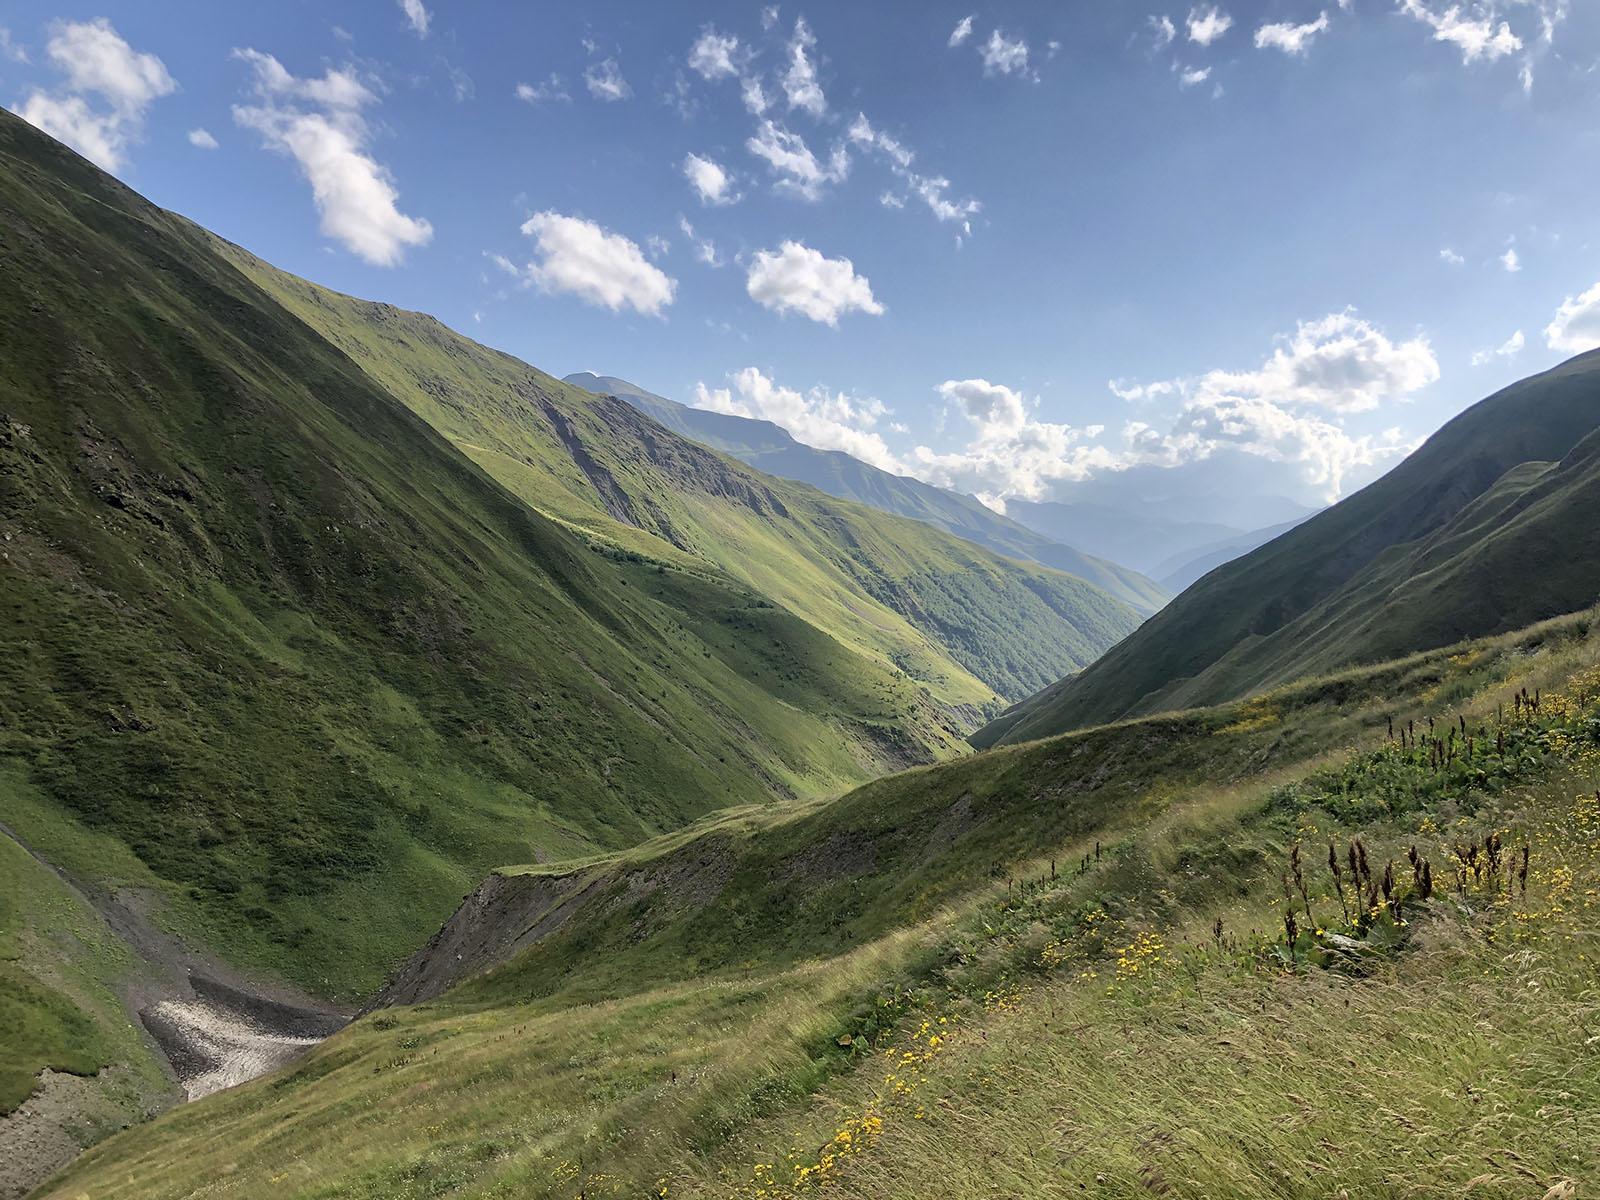 Долина реки Закка. Вид на пройденный маршрут